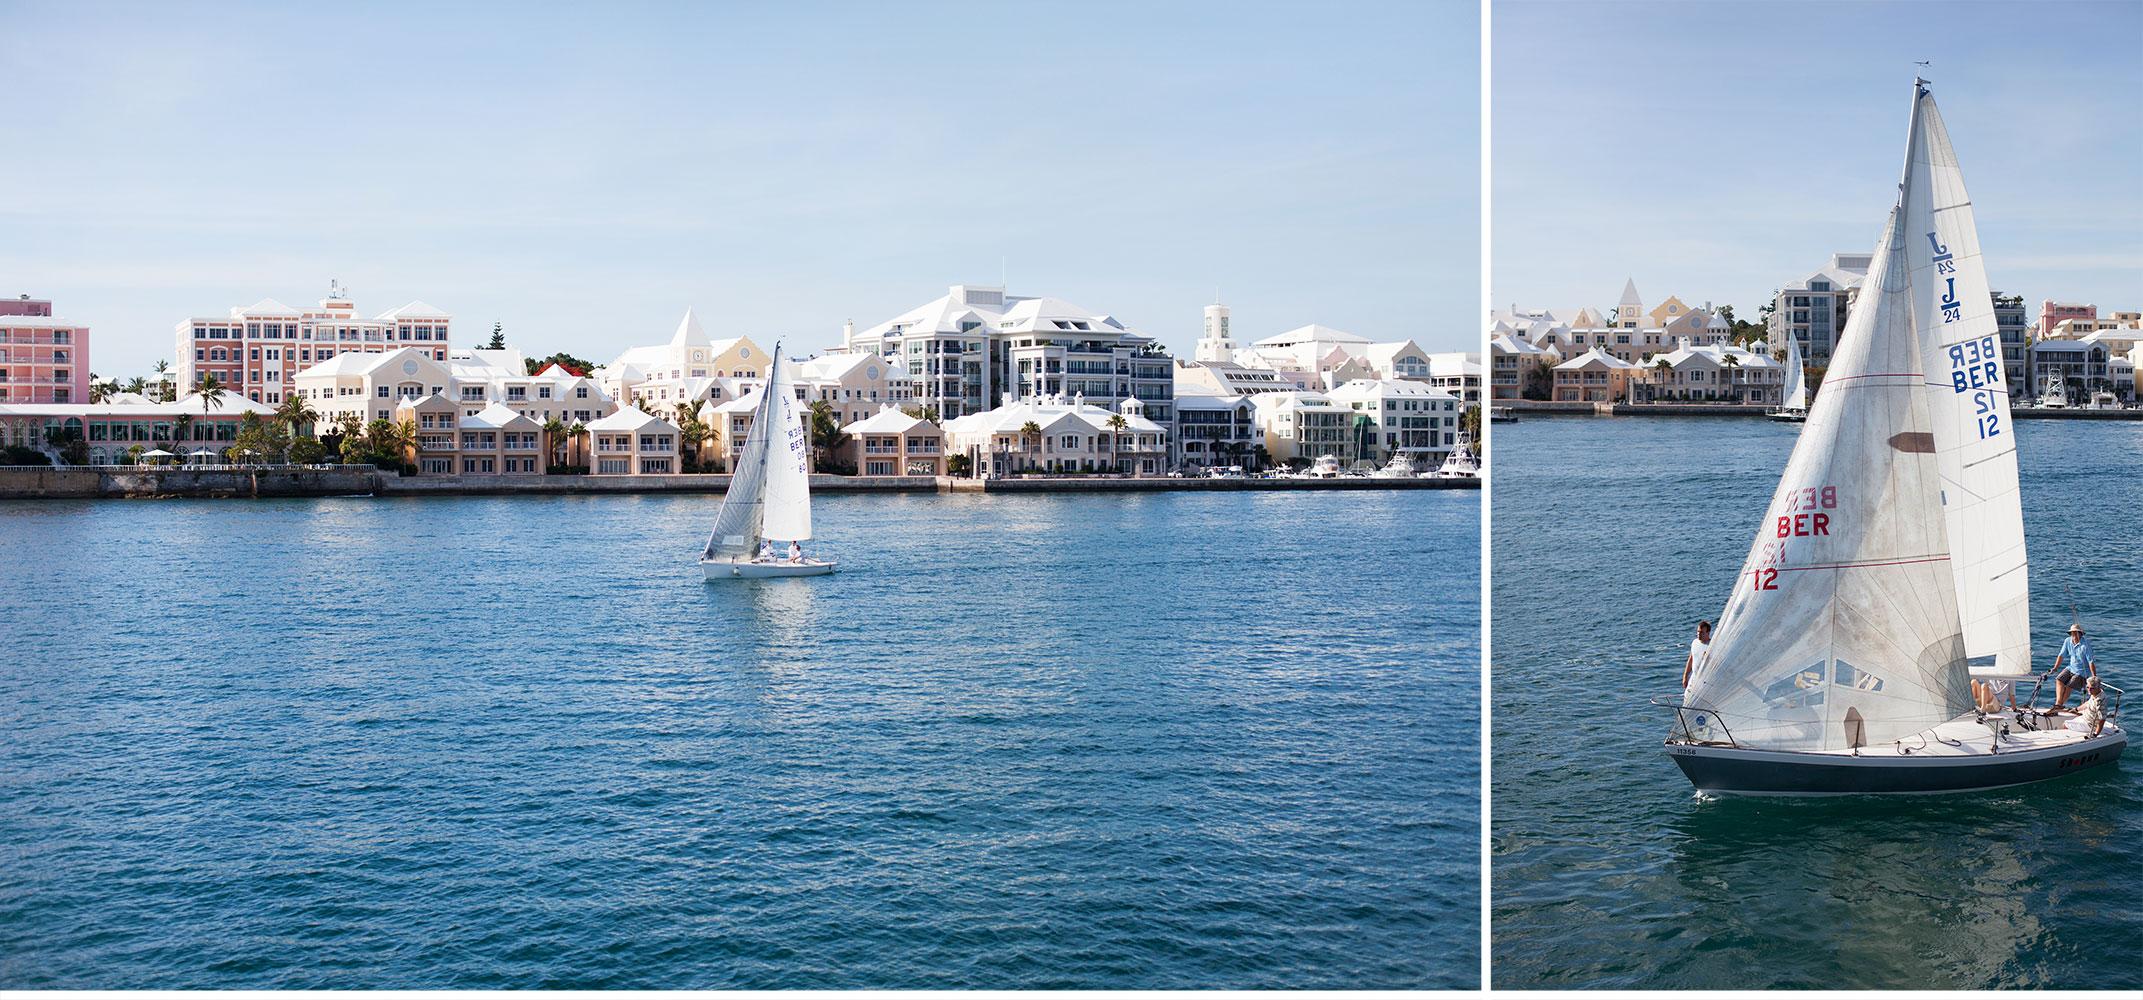 You've Got Flair | Sailboats in Hamilton, Bermuda; Summer 2014